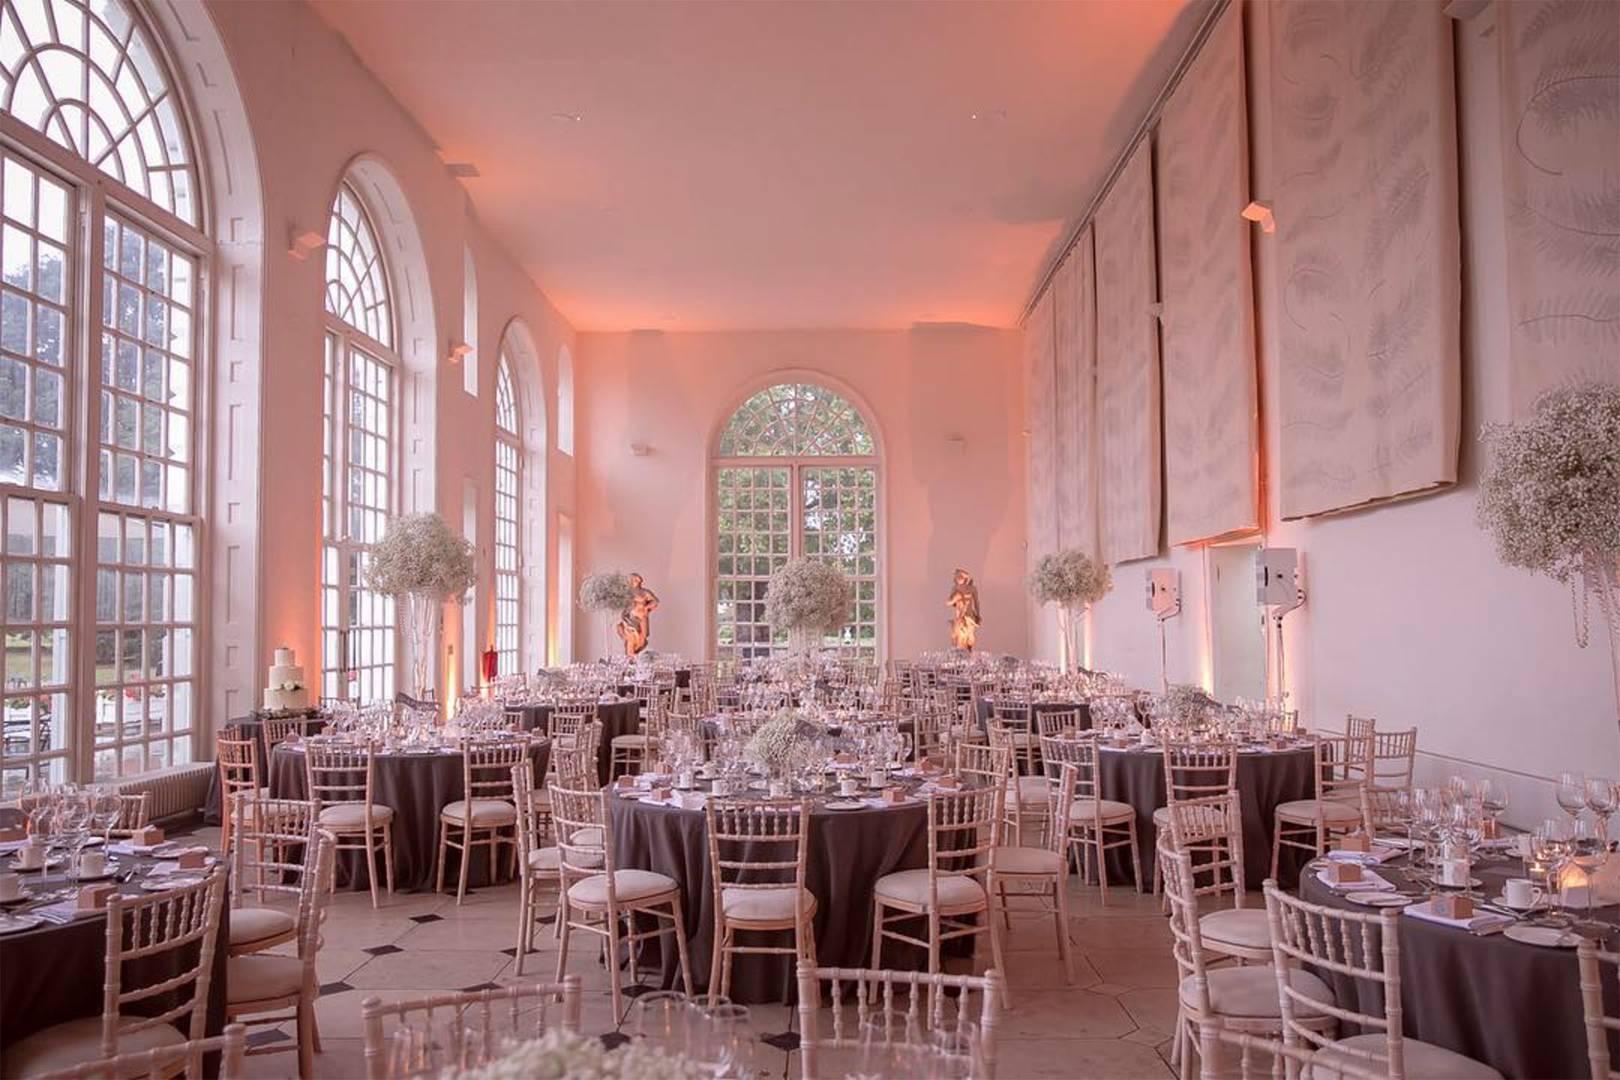 How Uk Wedding Industry Is Coping In Coronavirus Advice For Brides Tatler